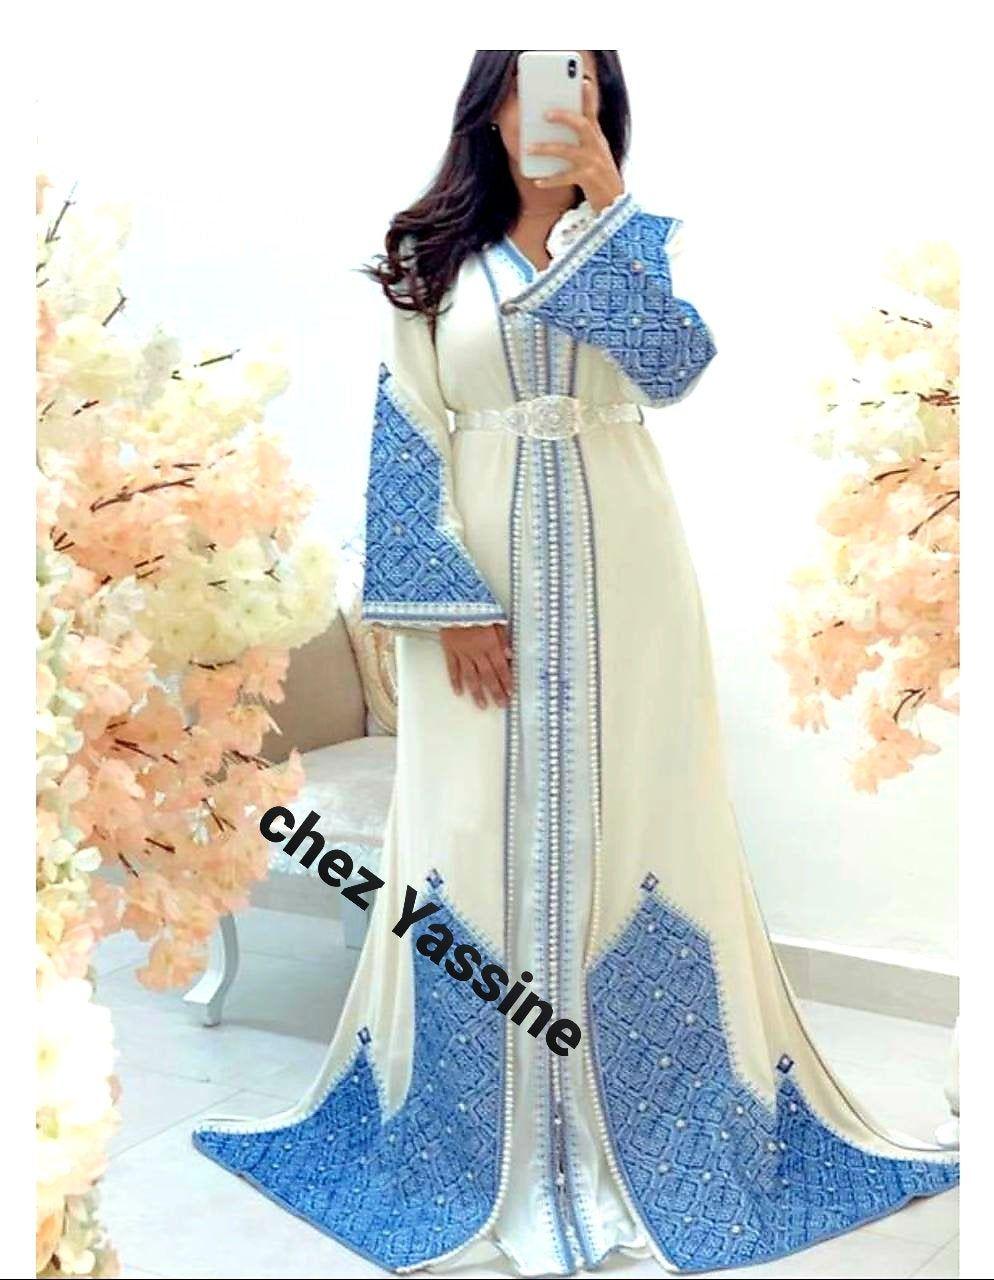 Kaftan dress, Moroccan New Caftan dress For women, wedding dress ,abbayas, kaftan maxi dress, birthday, anniversary gift